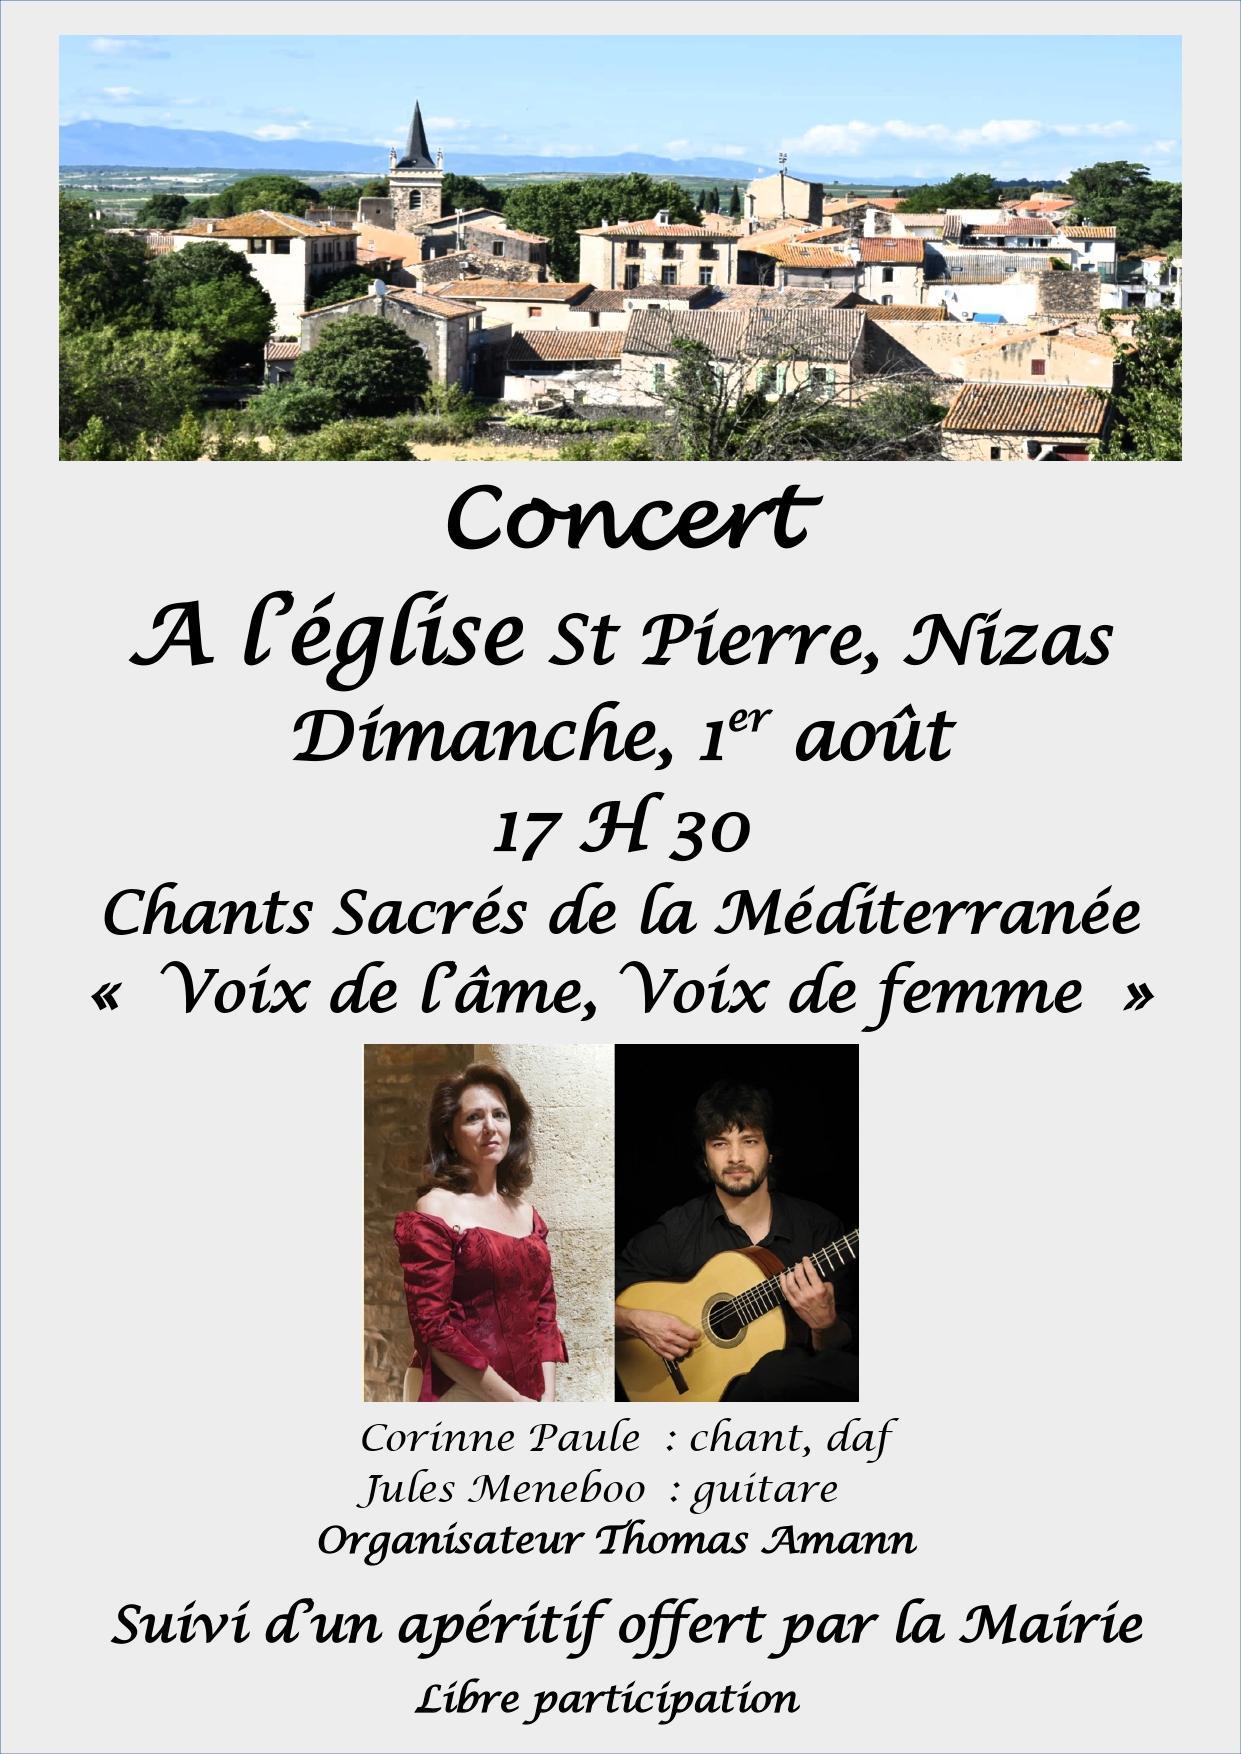 Affiche concert rect 1 08 31 page 0001